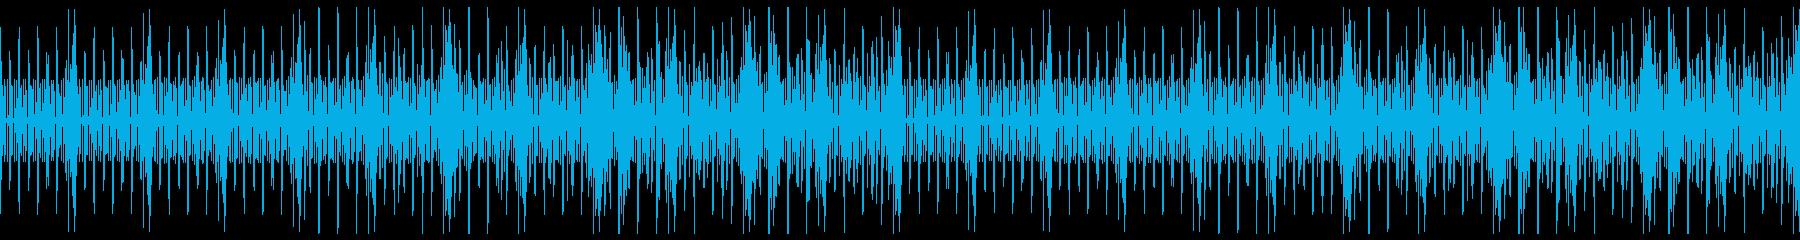 Mechanical alarm clock's reproduced waveform